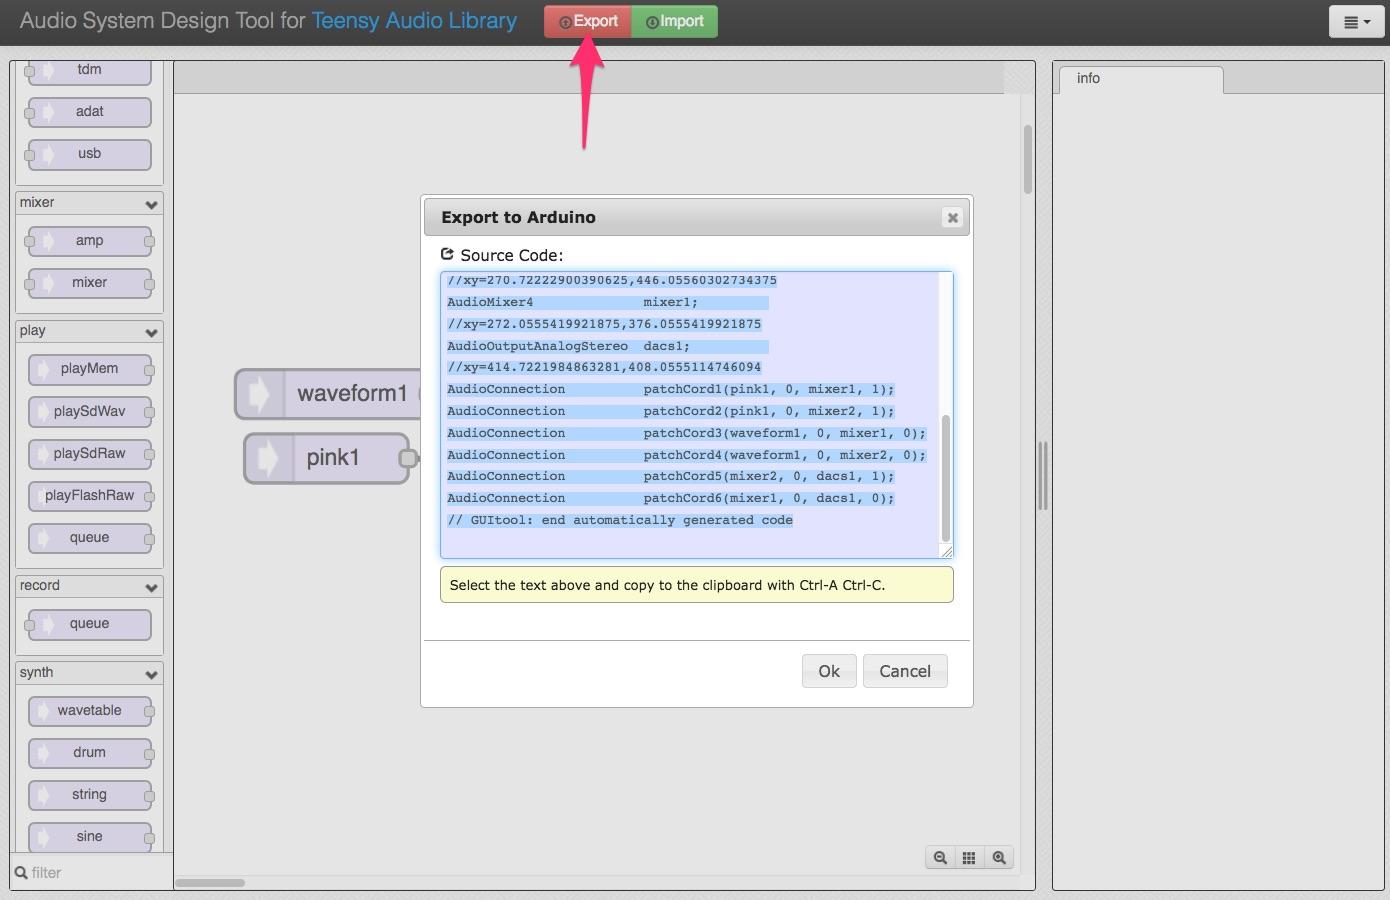 adabox_Audio_System_Design_Tool_for_Teensy_Audio_Library_10.jpg